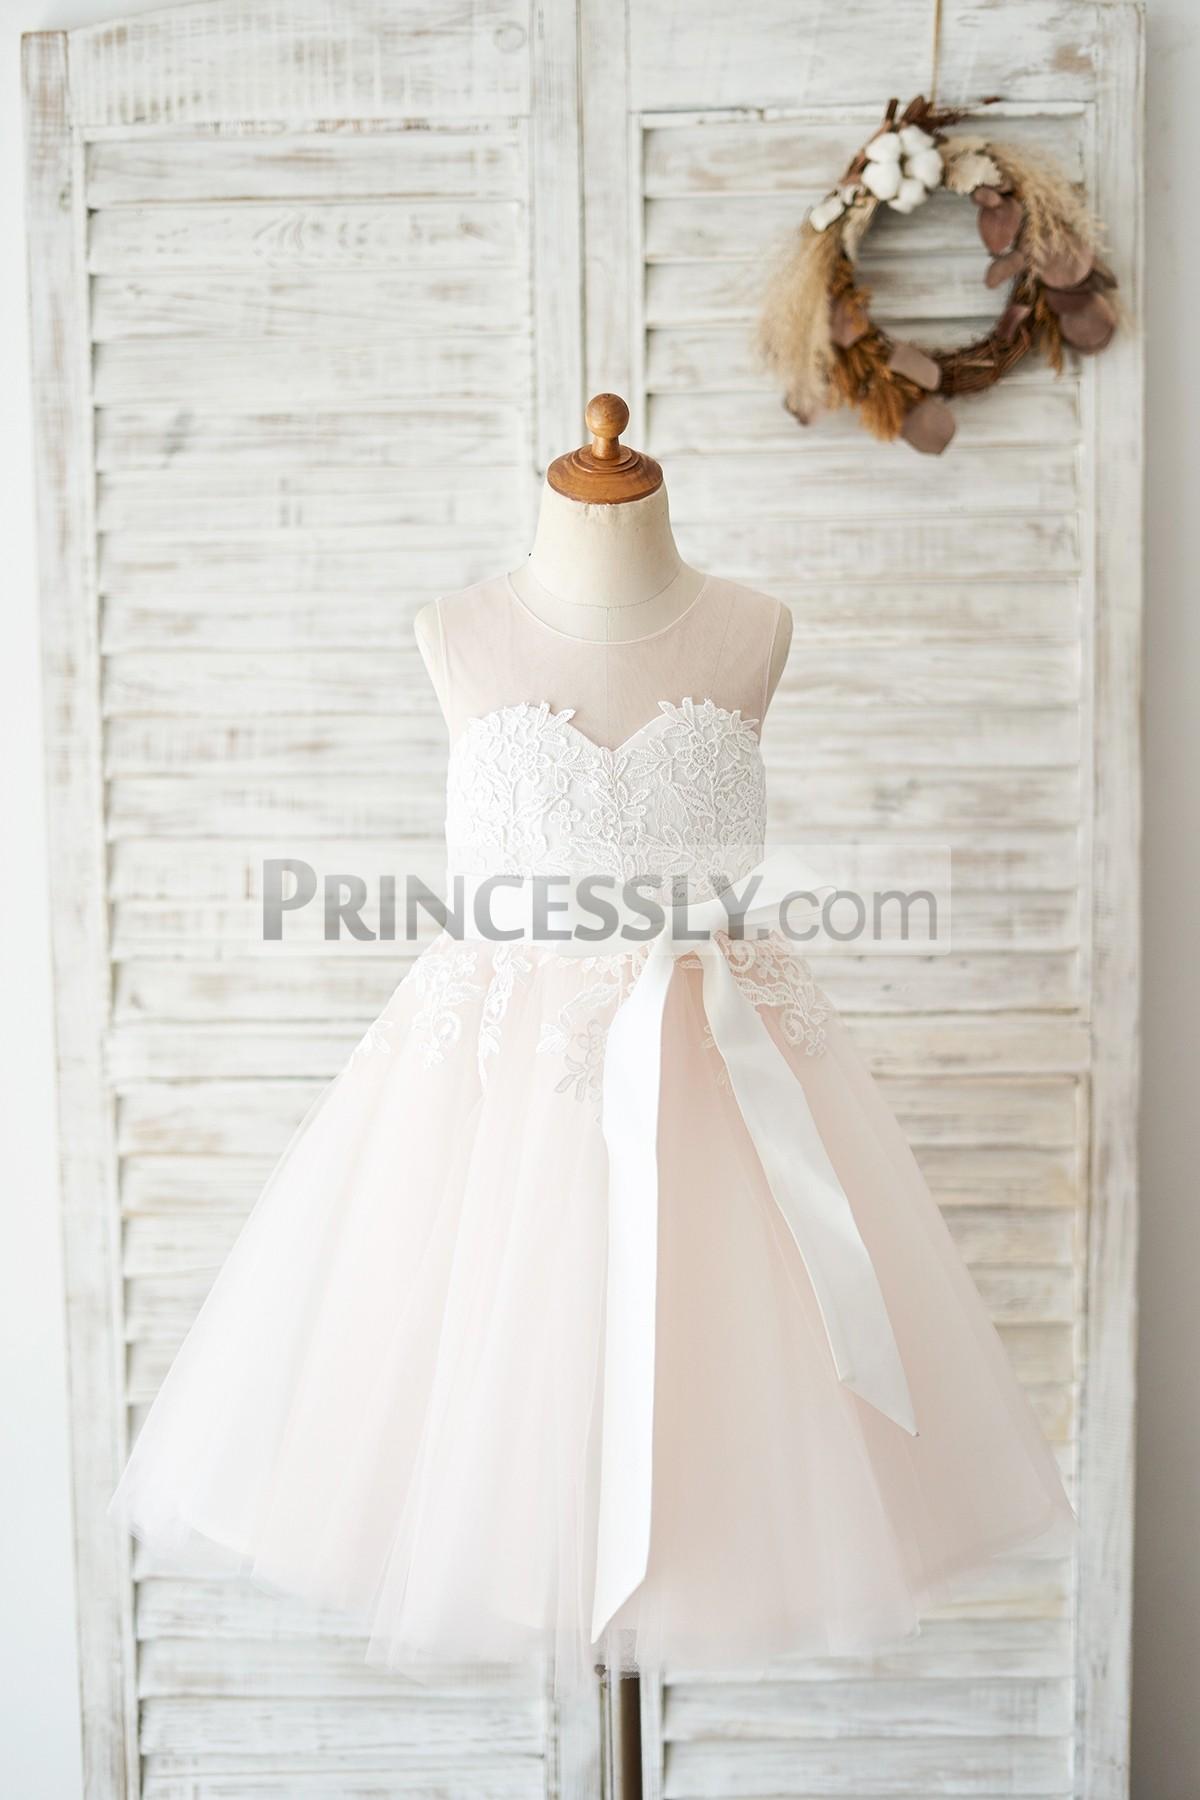 Princessly.com-K1004038-Keyhole Back Ivory Lace Pink Tulle Wedding Flower Girl Dress-31